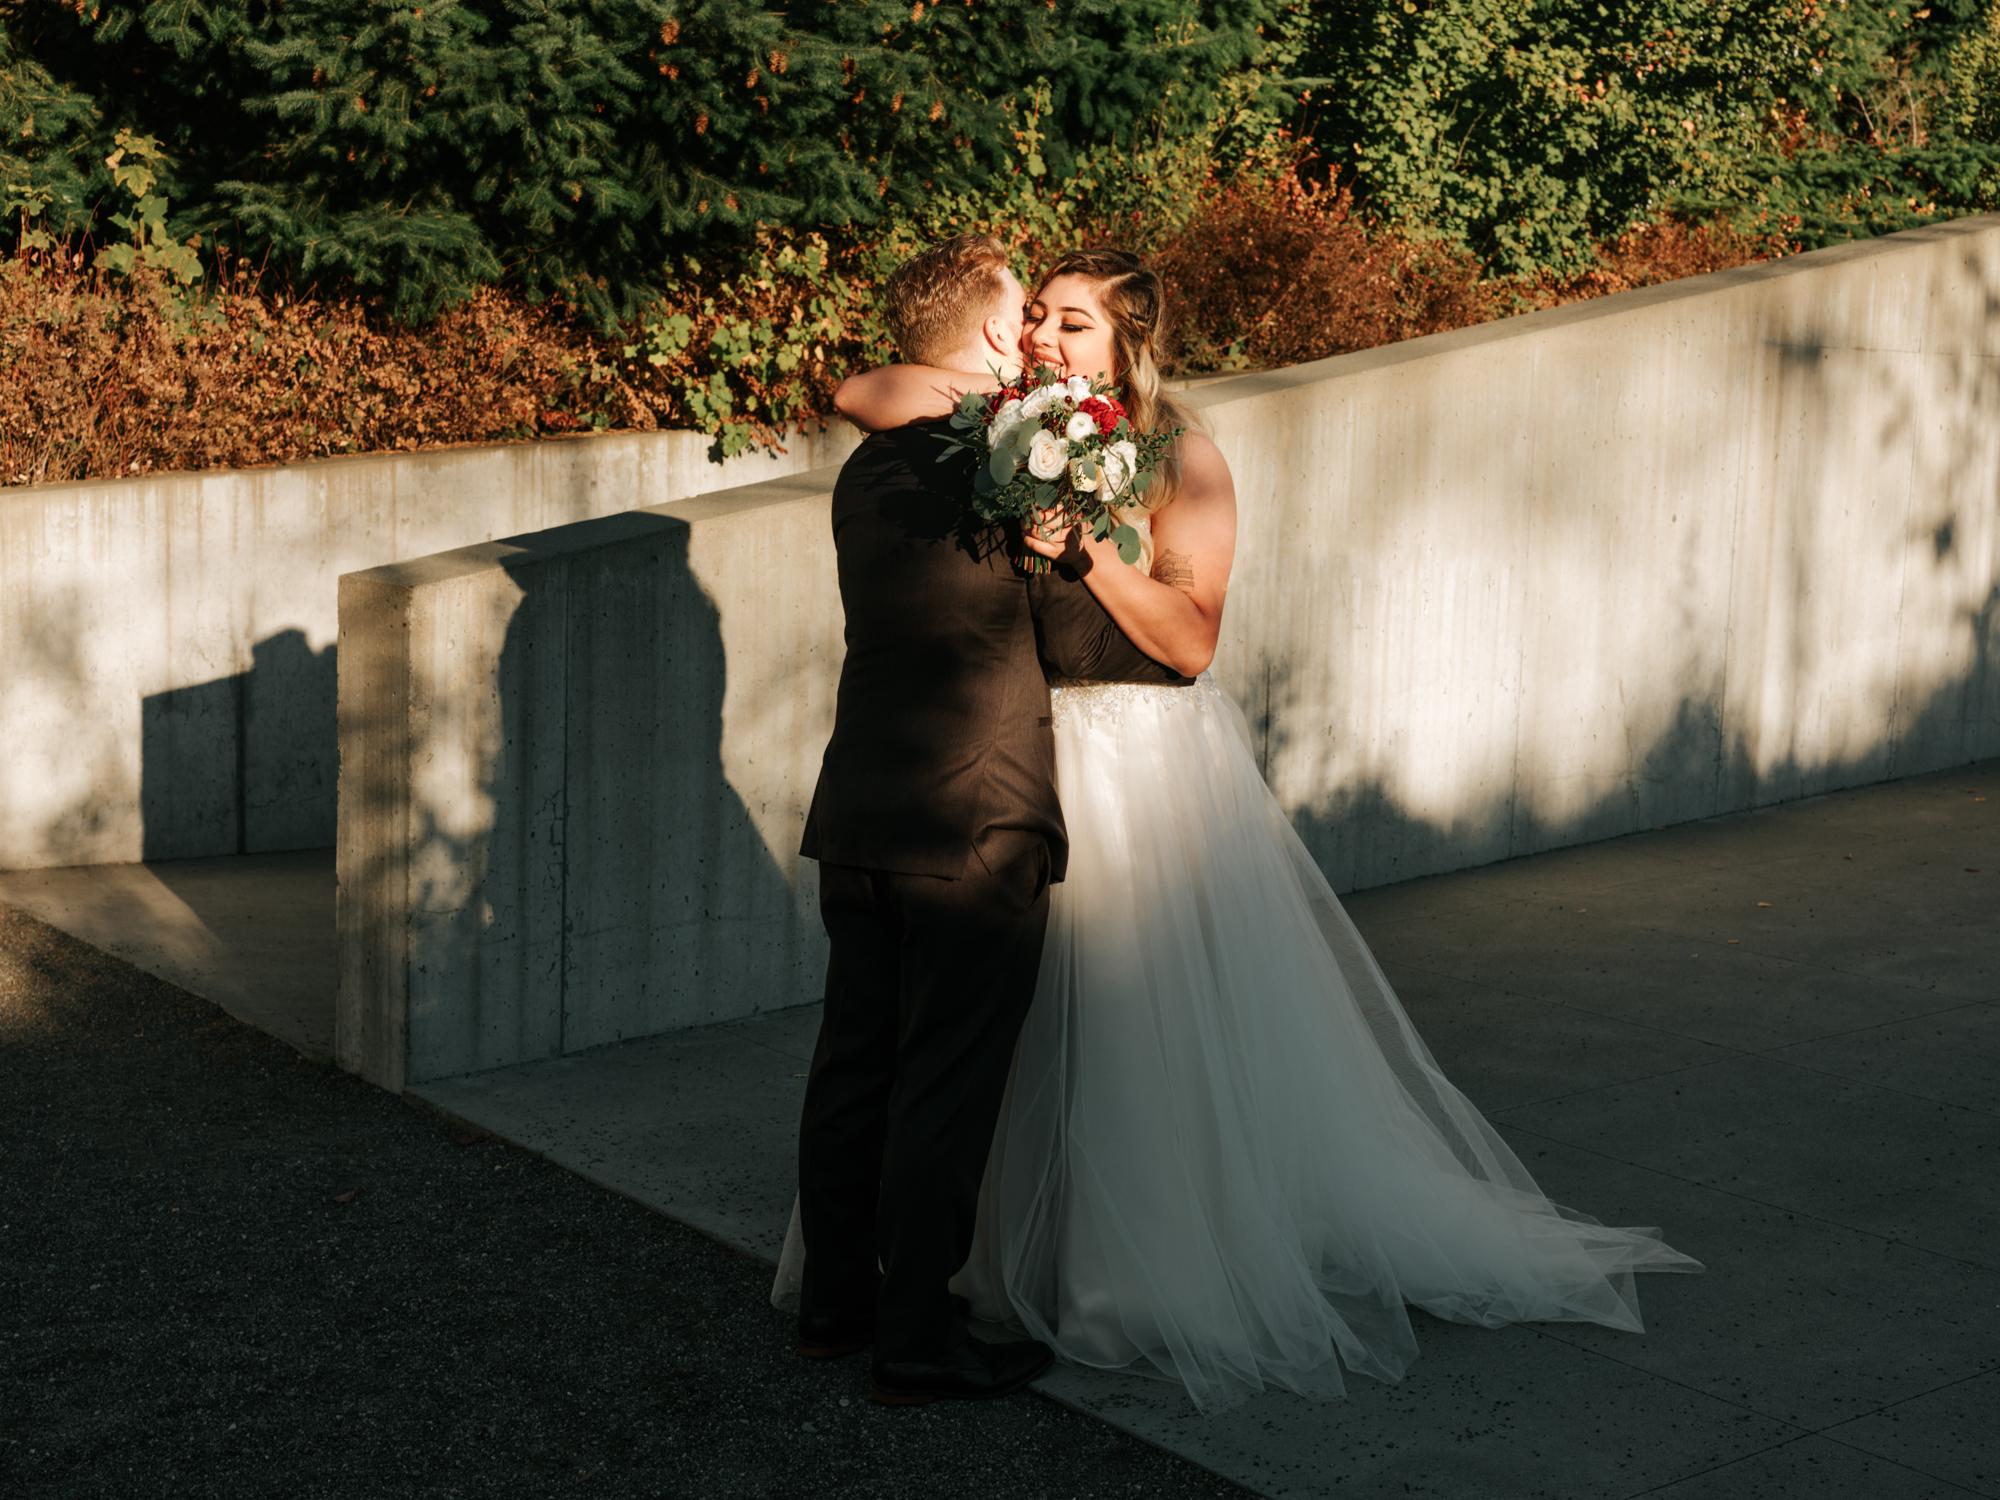 The Brown Wedding - Venue: The Edgewater HotelDJ:Bugsie ProductionsCake: Morfey's CakeDress:Romashka Bridal / Maggie SotteroBridesmaid Dresses:Bill Levkoff